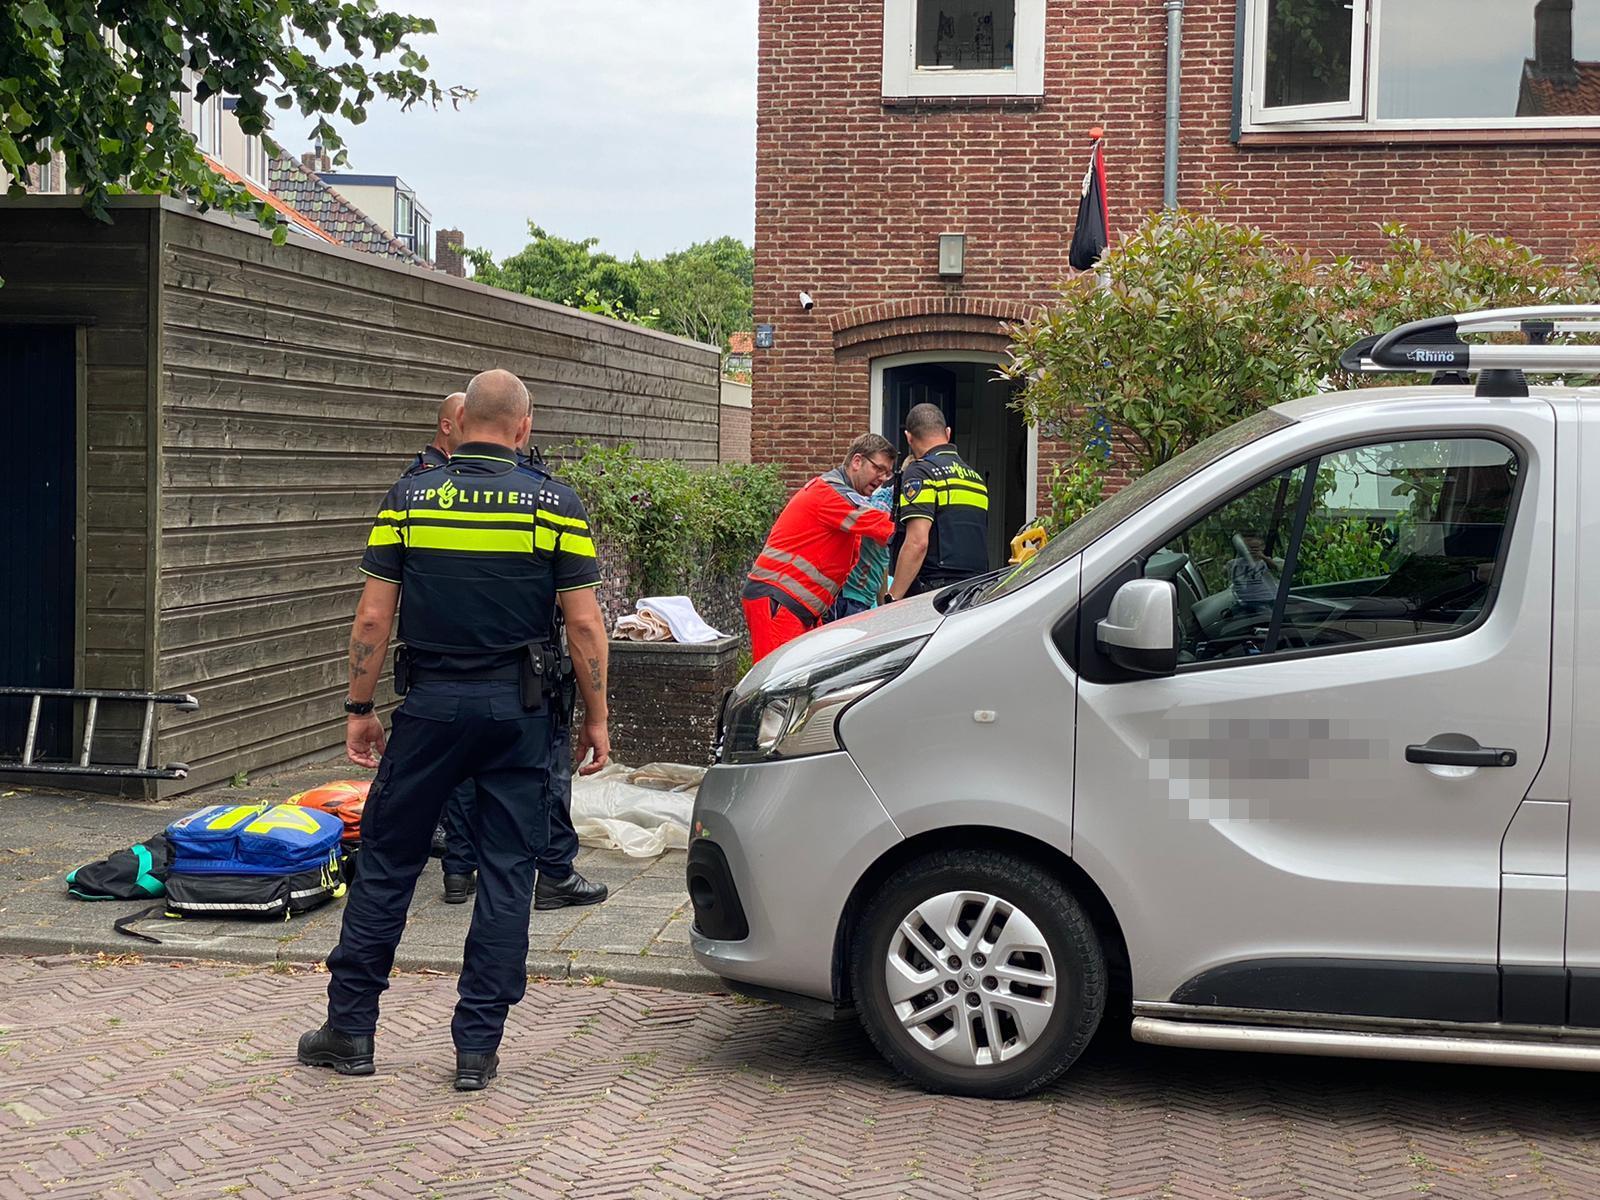 Man zwaargewond bij val van ladder in Leiderdorp, traumahelikopter ingeschakeld